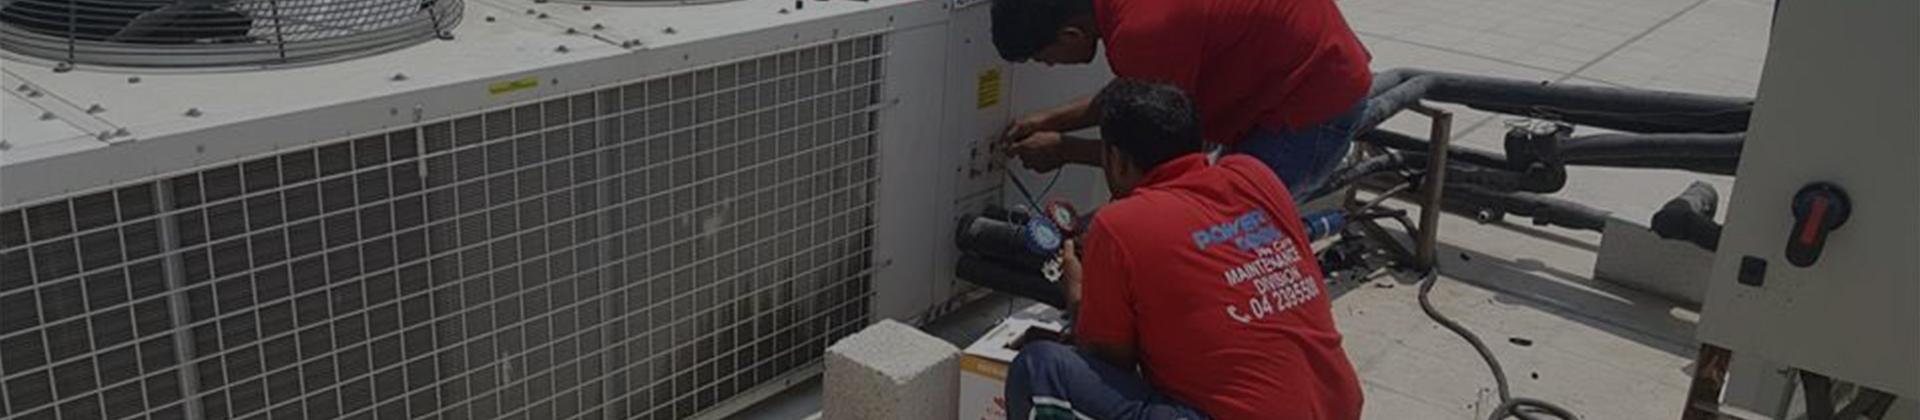 chiller maintenance service dubai